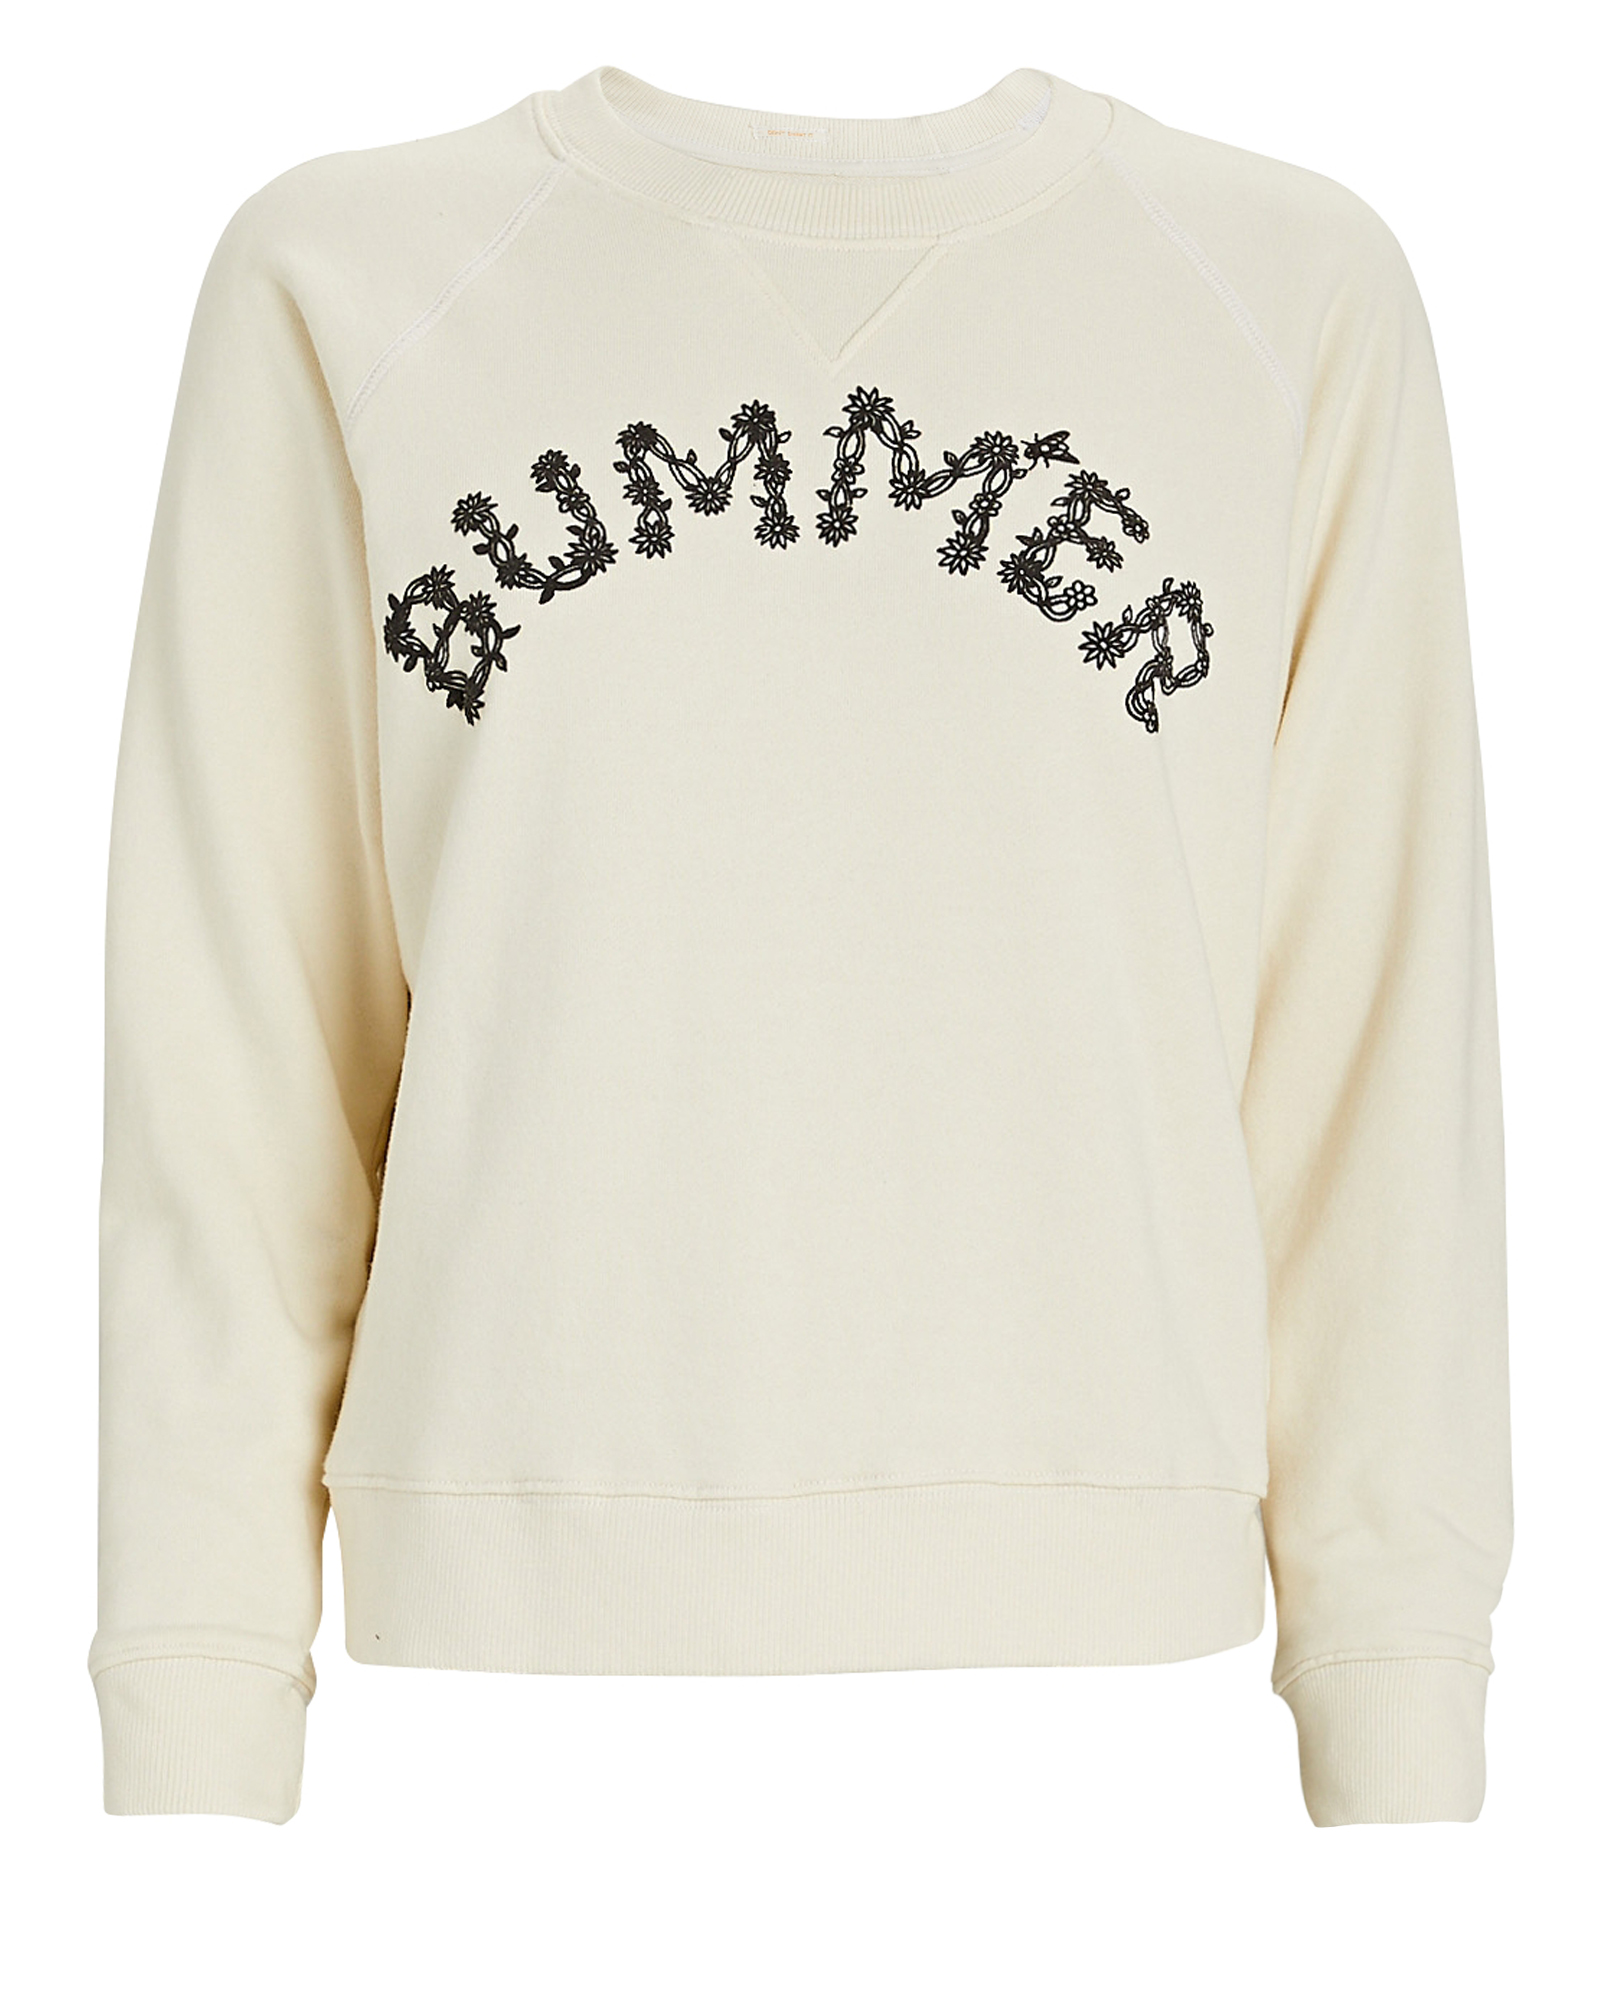 Mother Sweatshirts The Square Bummer Sweatshirt